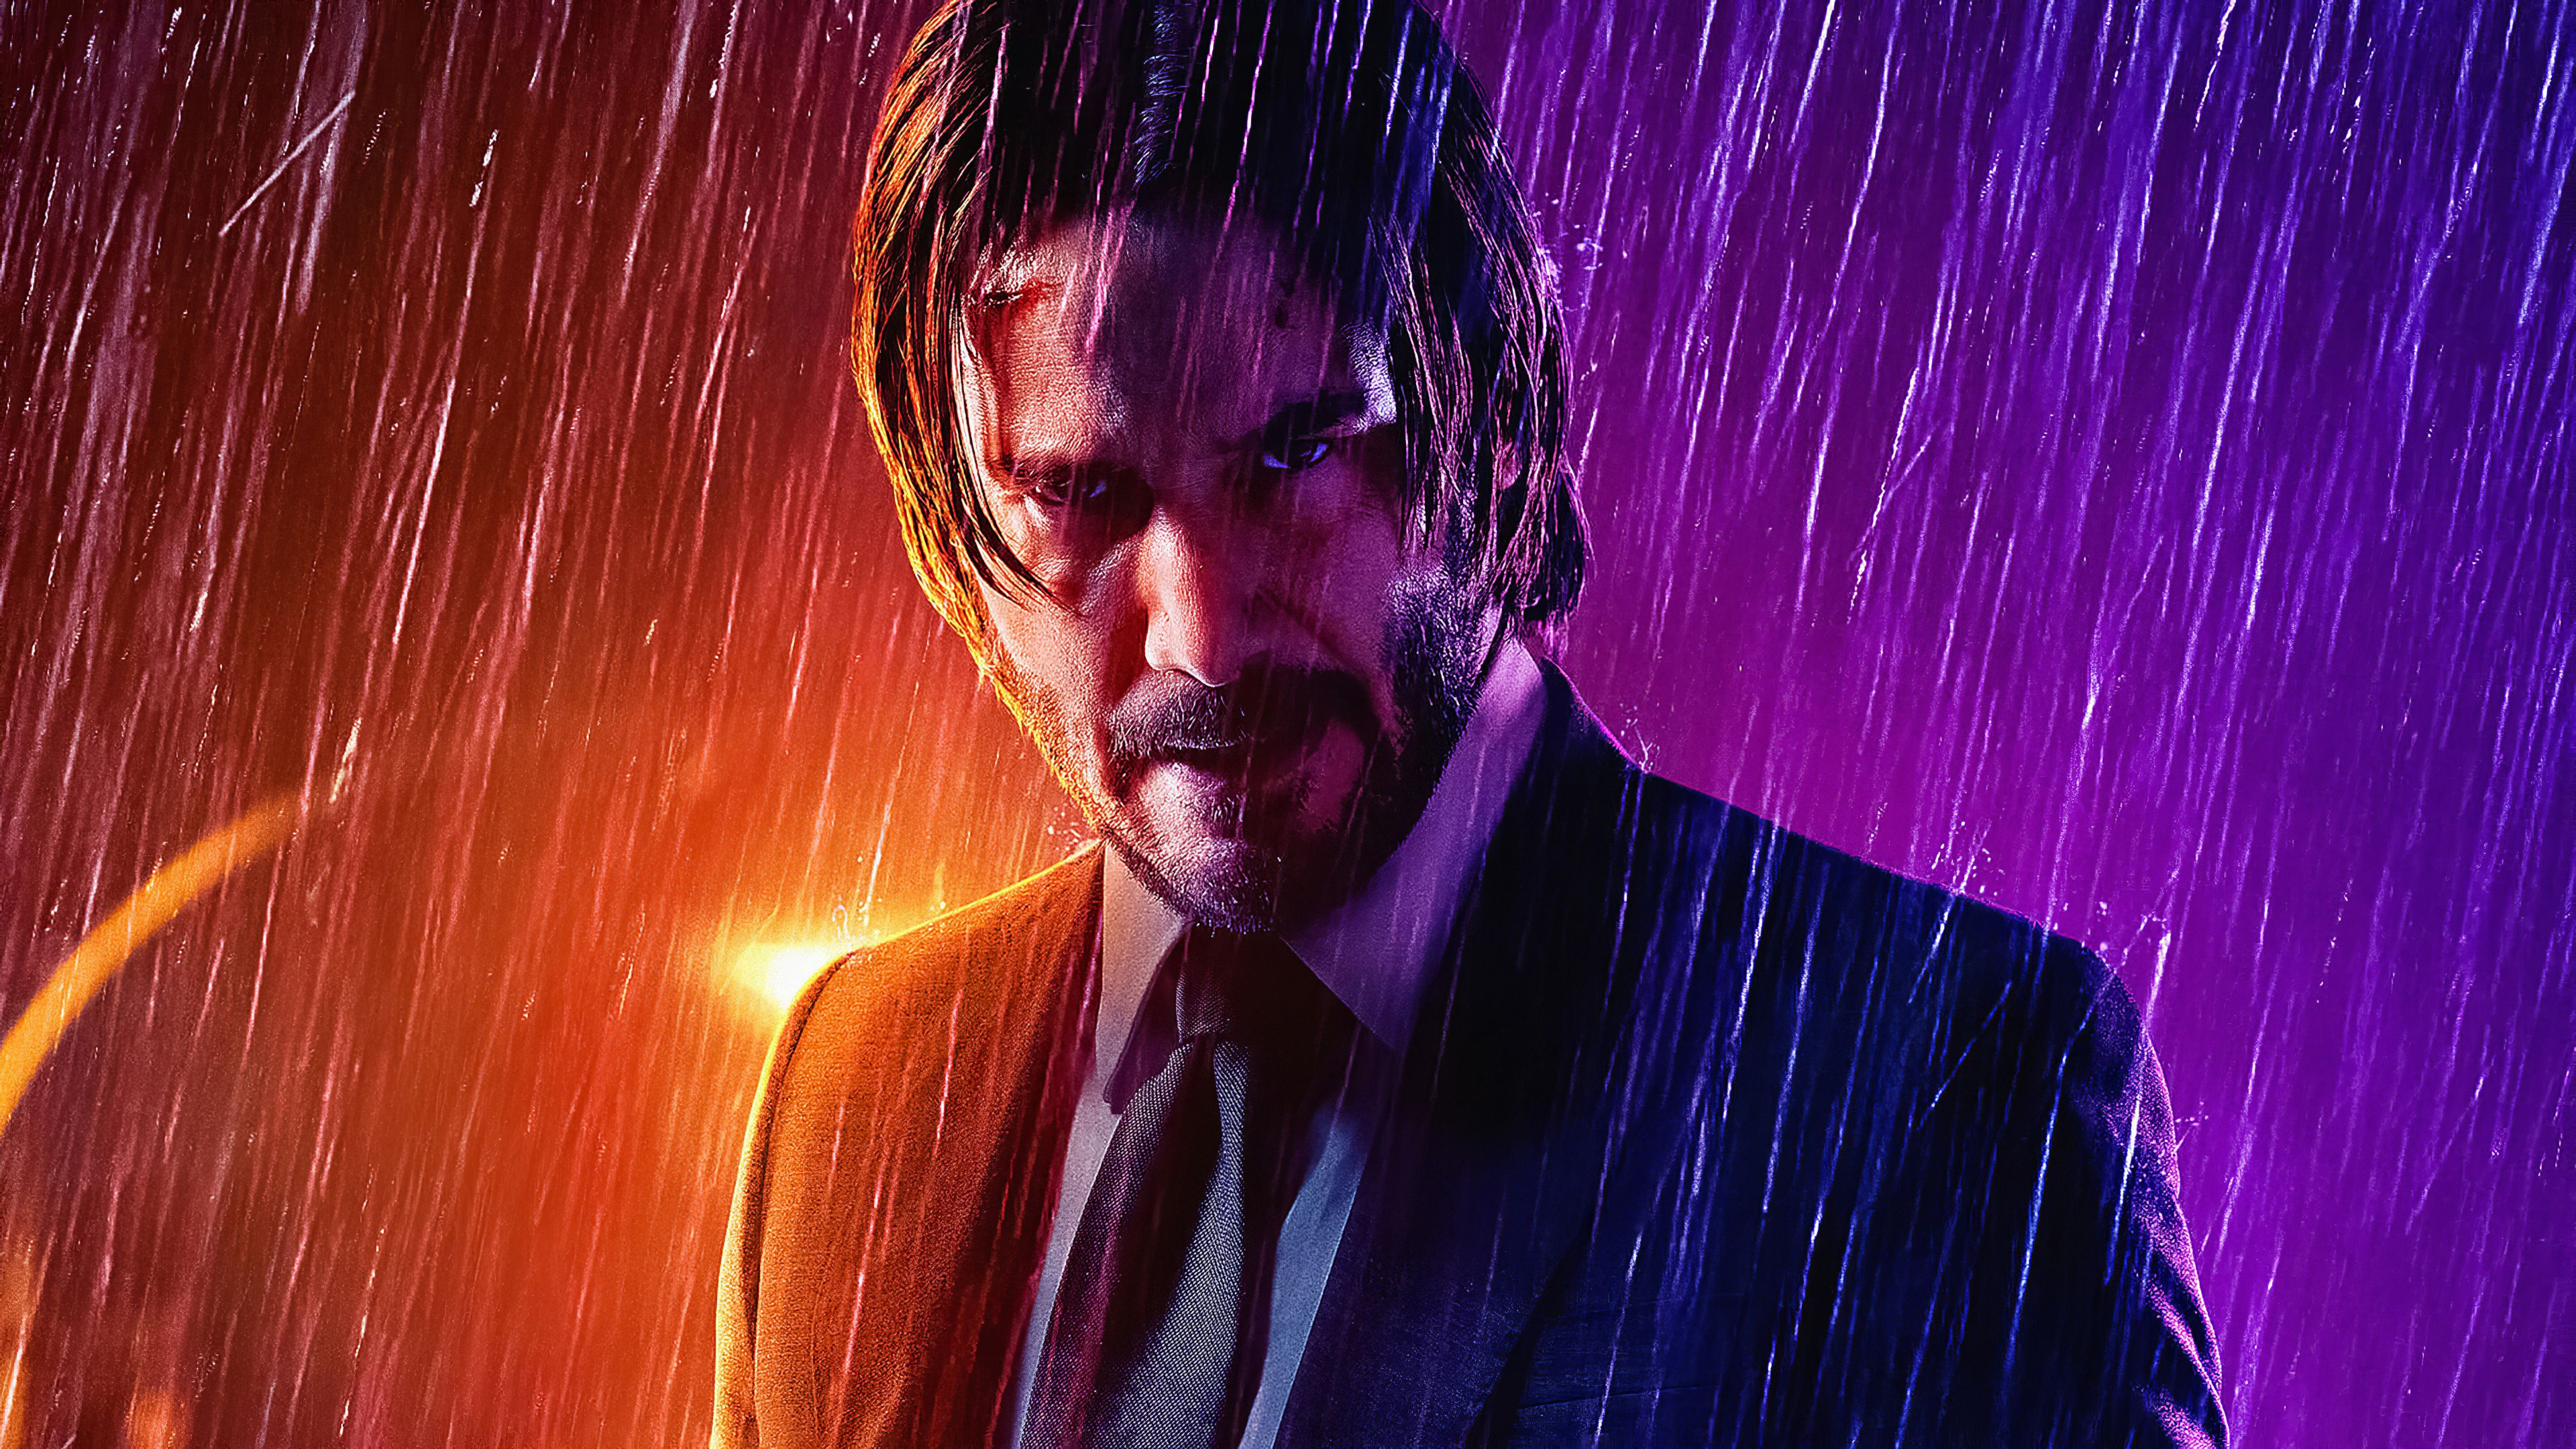 John Wick In Rain John Wick In Rain Wallpaper 4k John Wick In Rain 4k Wallpaper Keanu Reeves Chapter 3 Movies